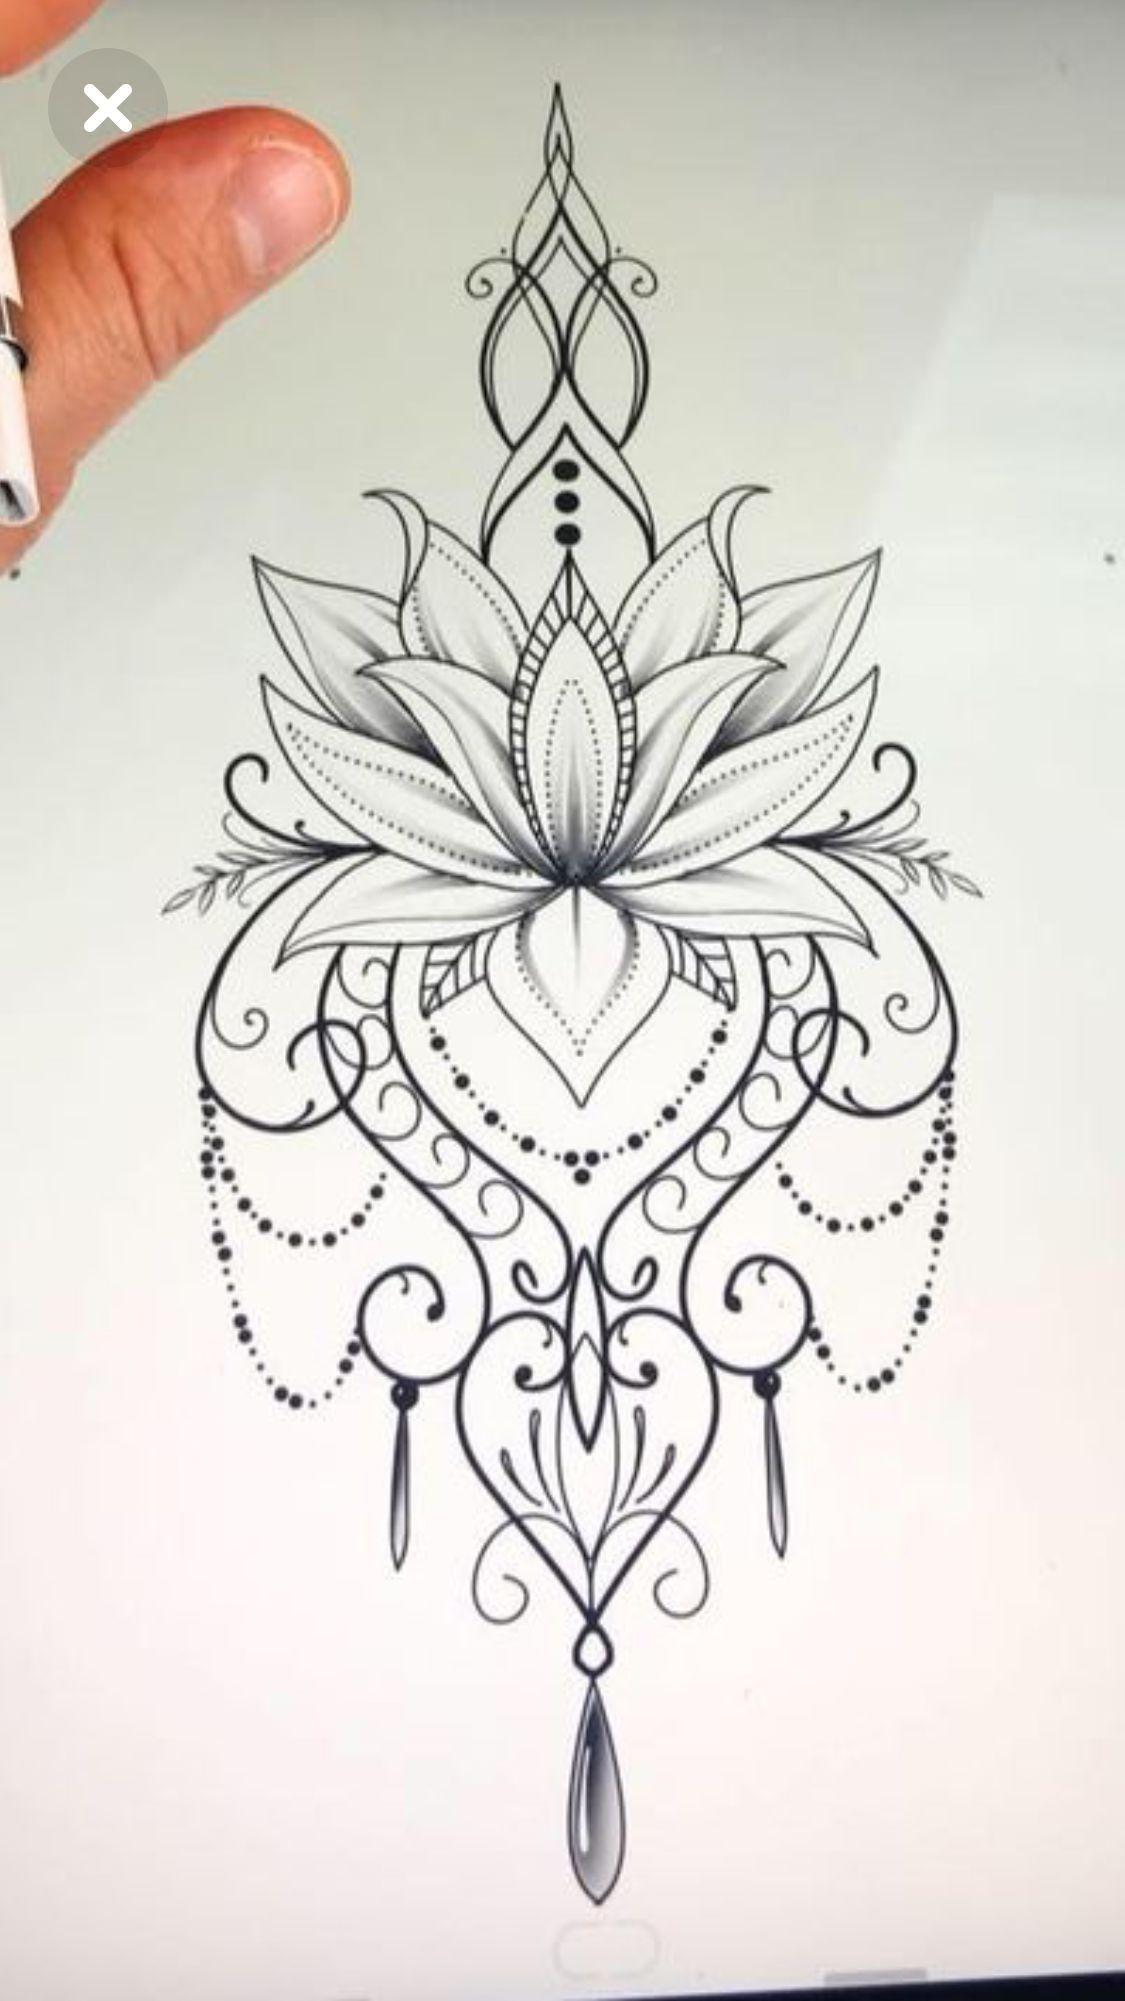 I Like The Lotus By Itself Mandala Tattoo Design Inspirational